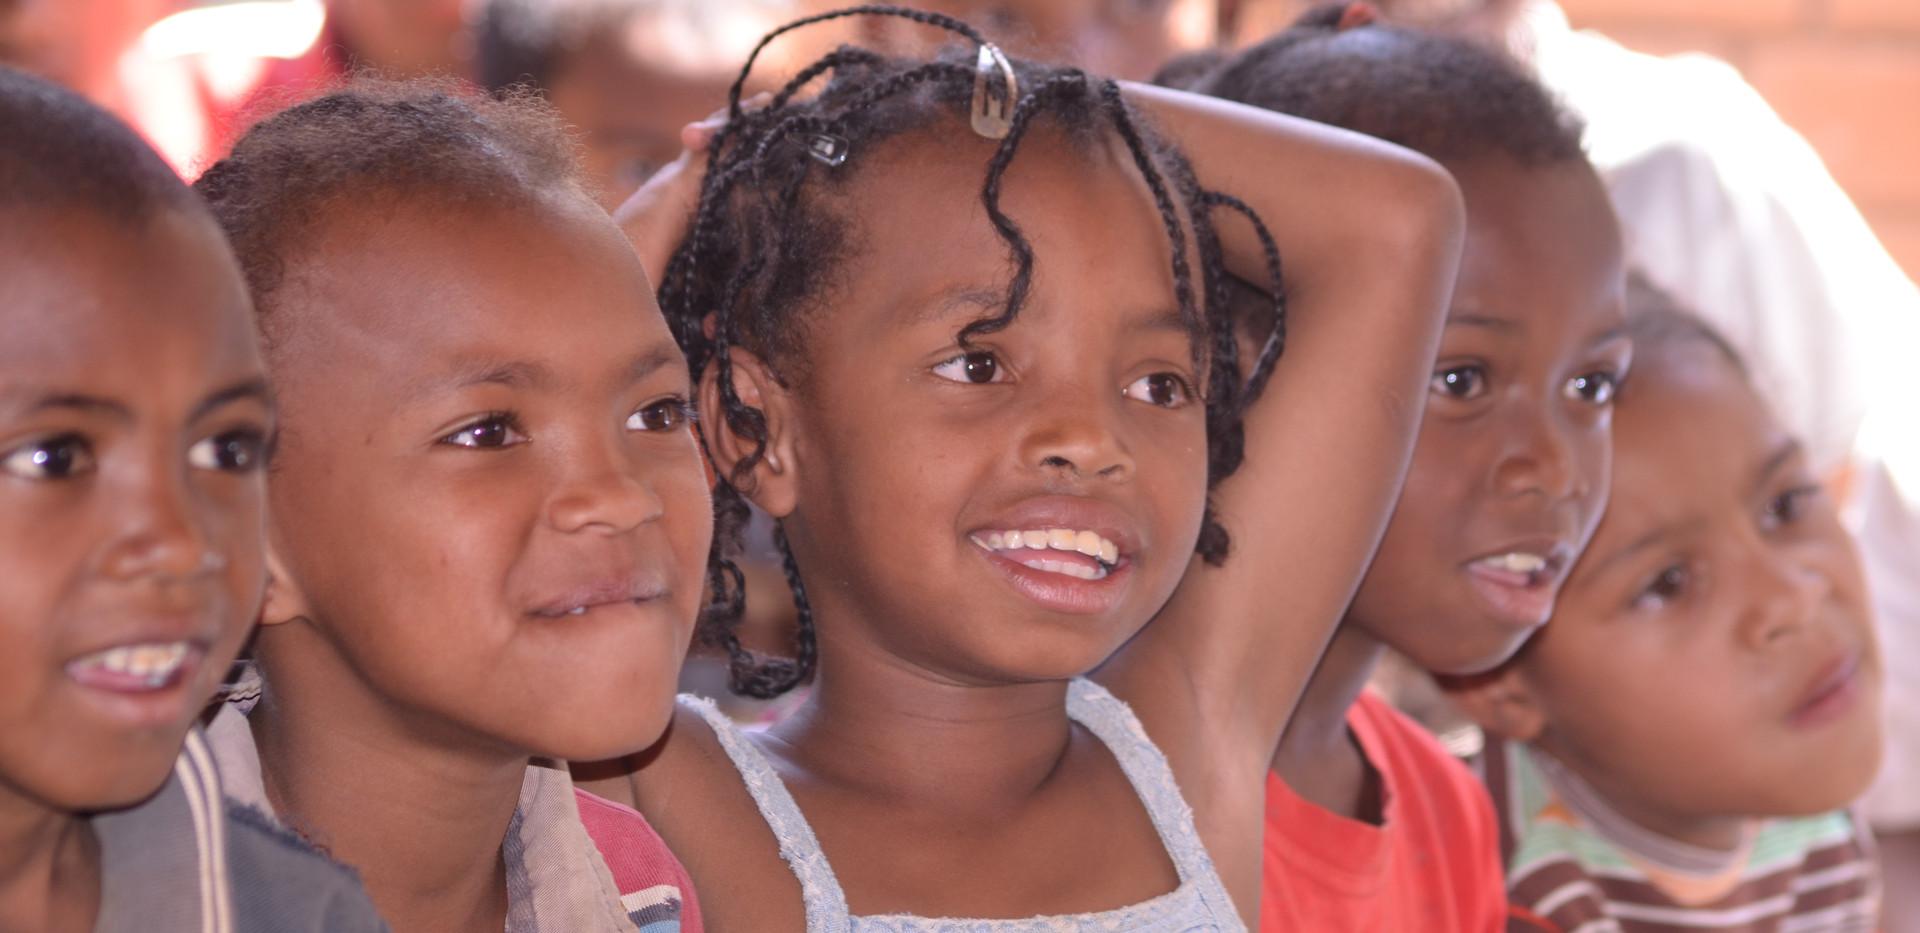 Madagascar2014_03.JPG